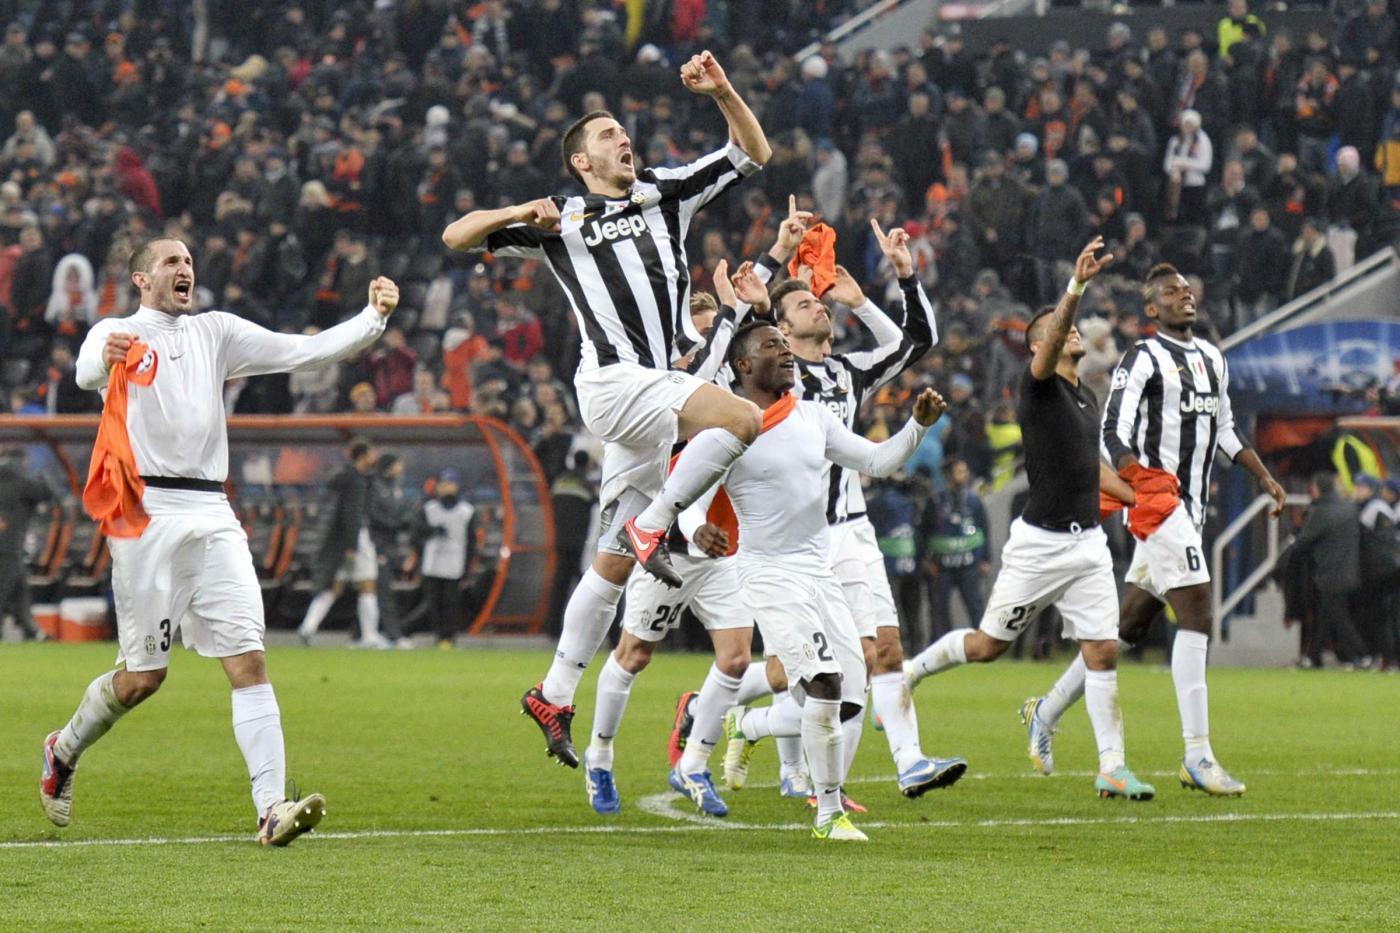 Ascolti tv mercoledì 5 dicembre 2012: la Juventus vince la partita e la serata